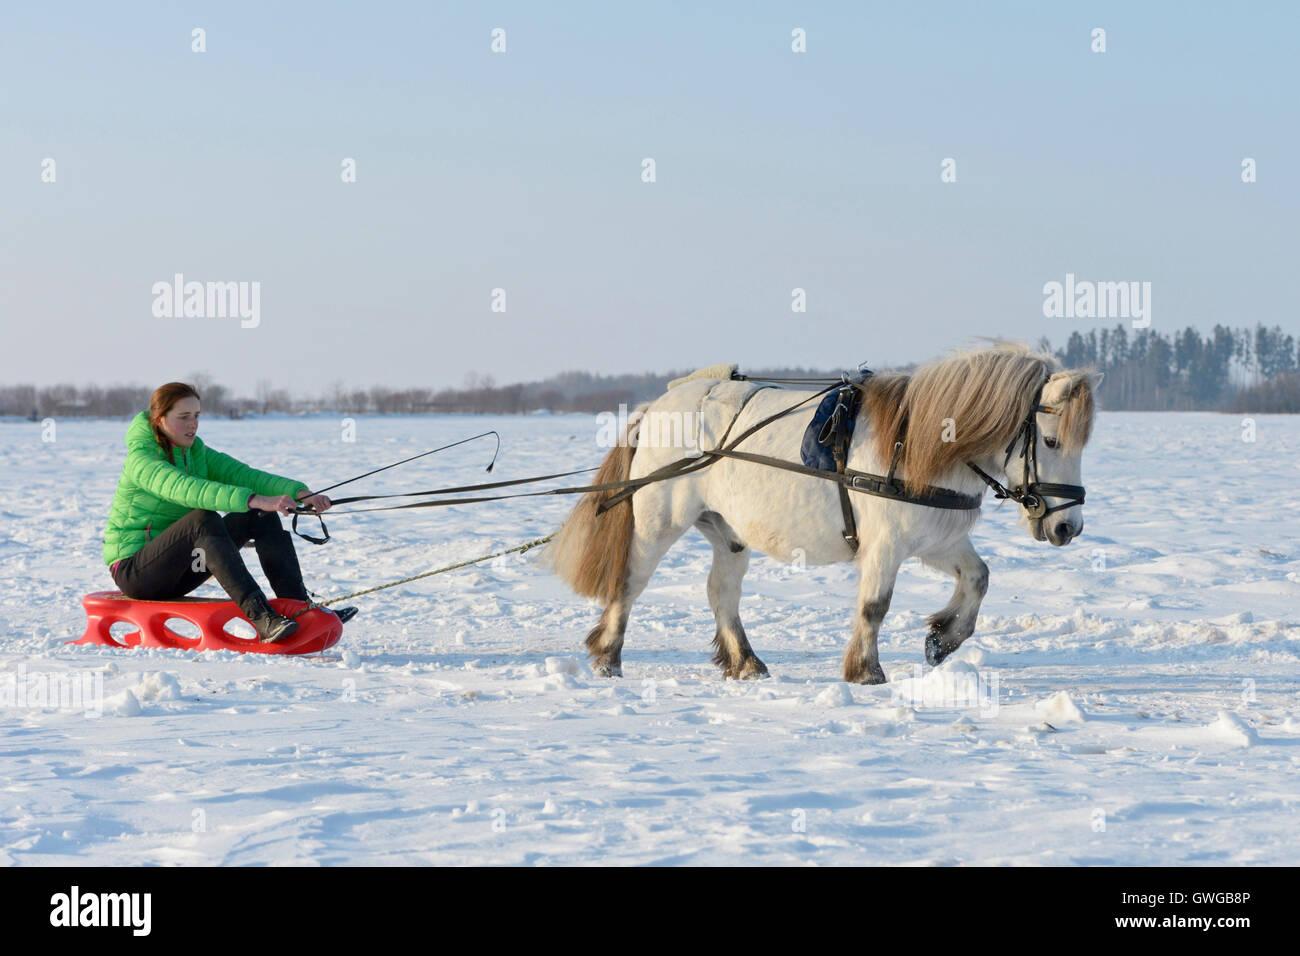 shetland pony pulling a sleigh germany stock photo 118988710 alamy